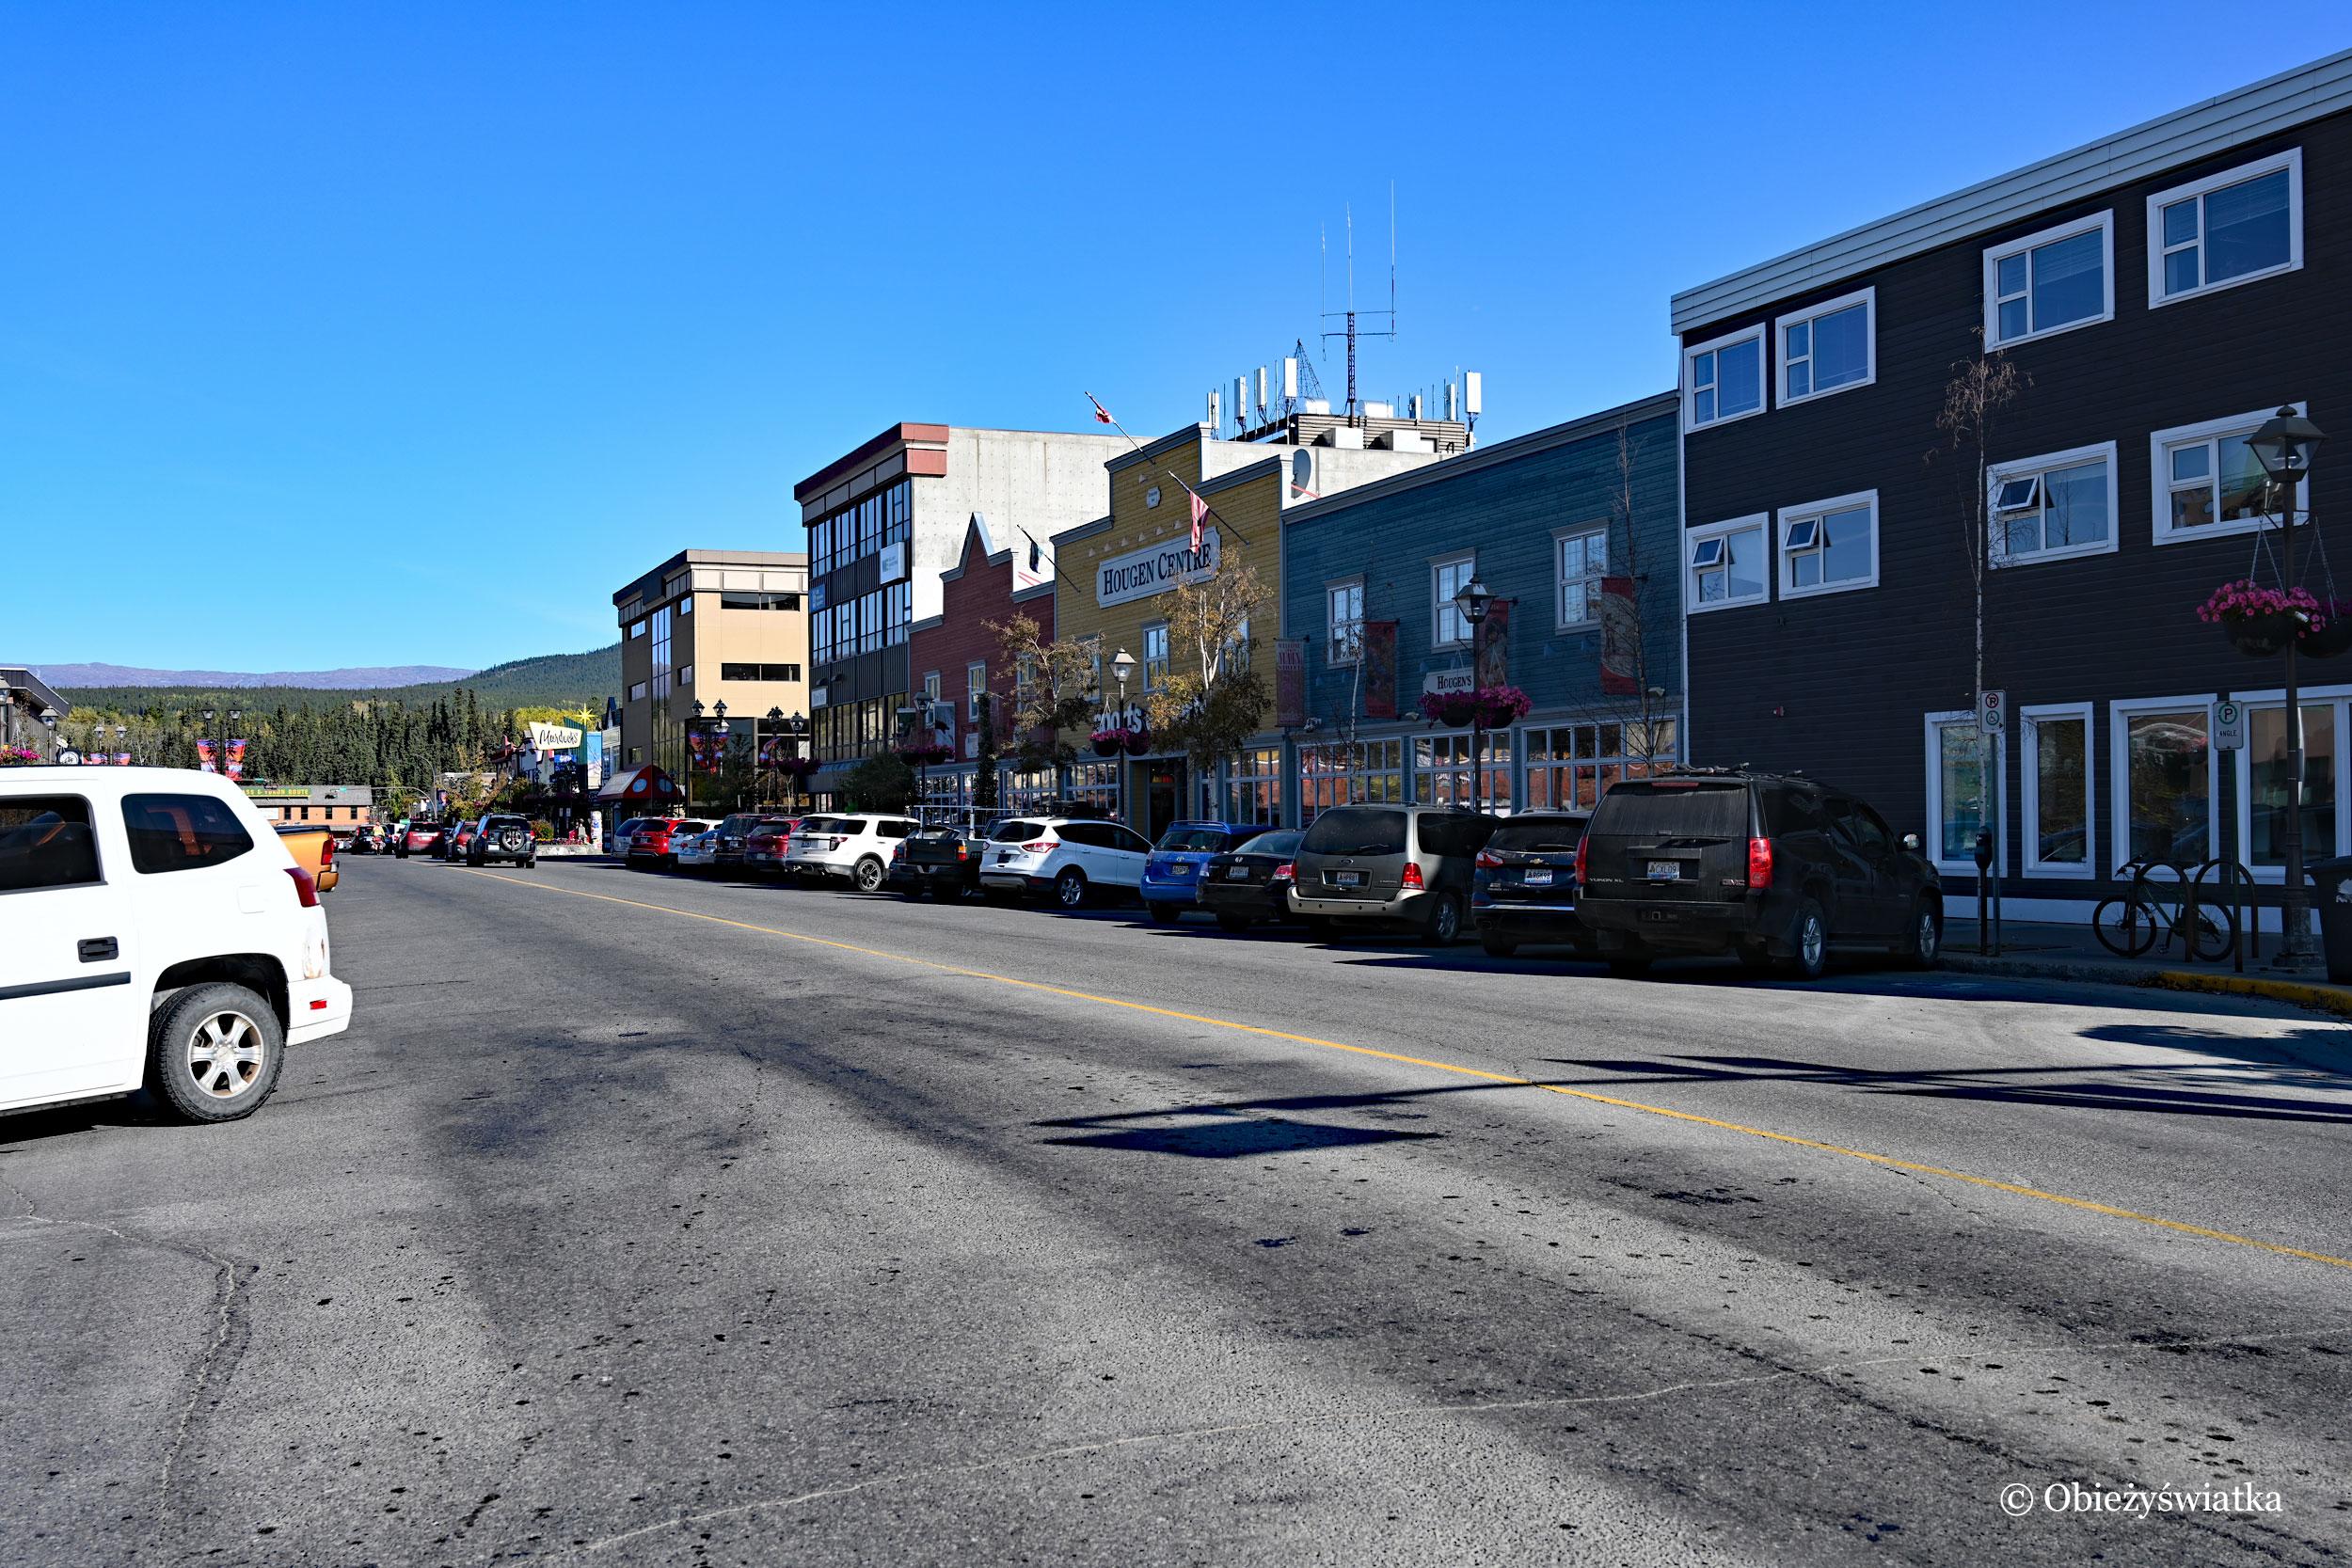 Typowe północnoamerykańskie miasto - Whitehorse, Kanada